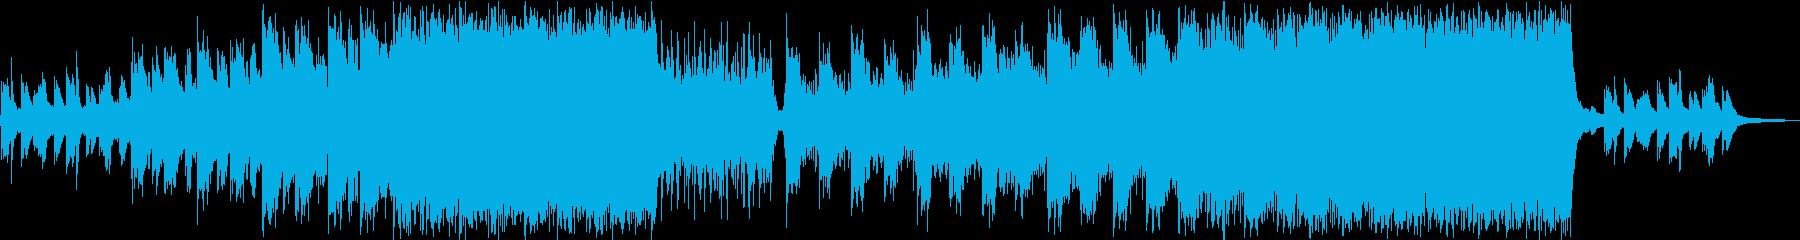 【CM,映像】感動的なピアノ、壮大の再生済みの波形